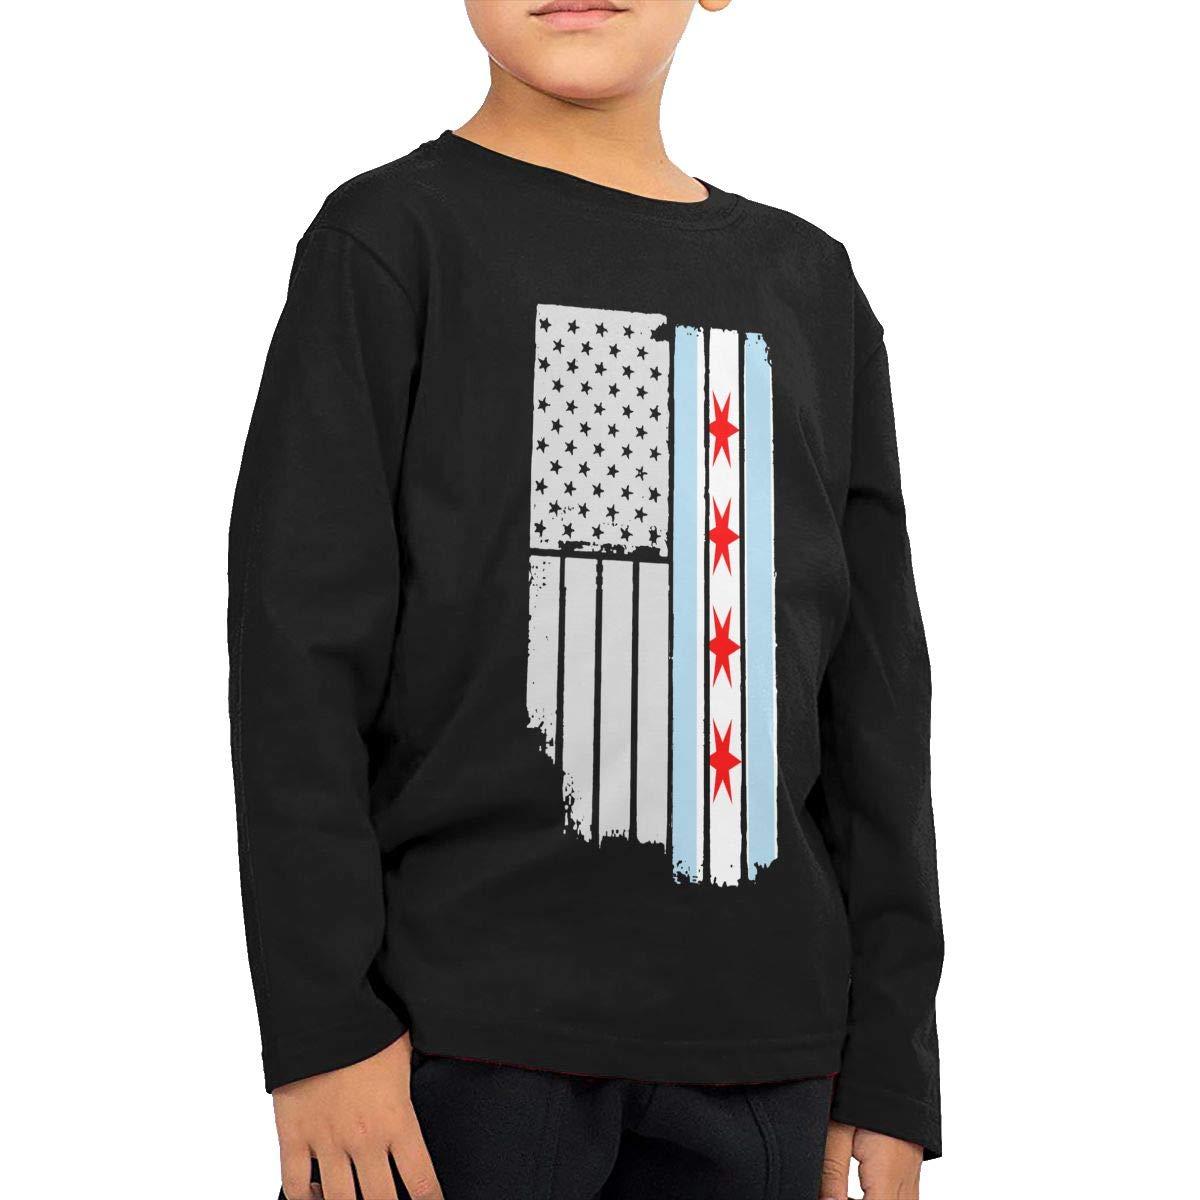 USA Vintage Chicago Flag Novelty Toddler Kid Baby Boys Girls Long Sleeve Tee Clothing